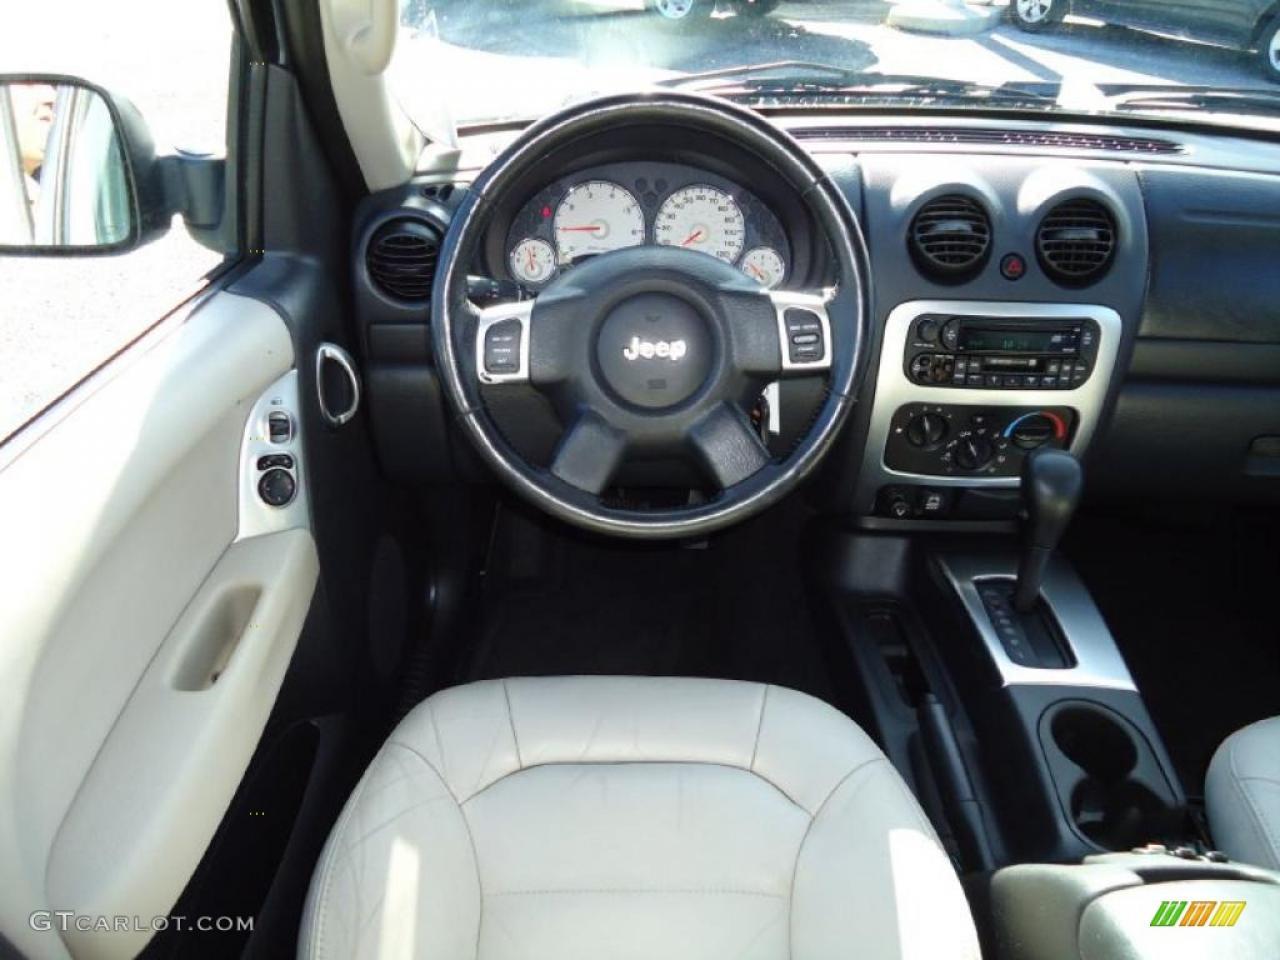 800 1024 1280 1600 Origin 2002 Jeep Liberty ...